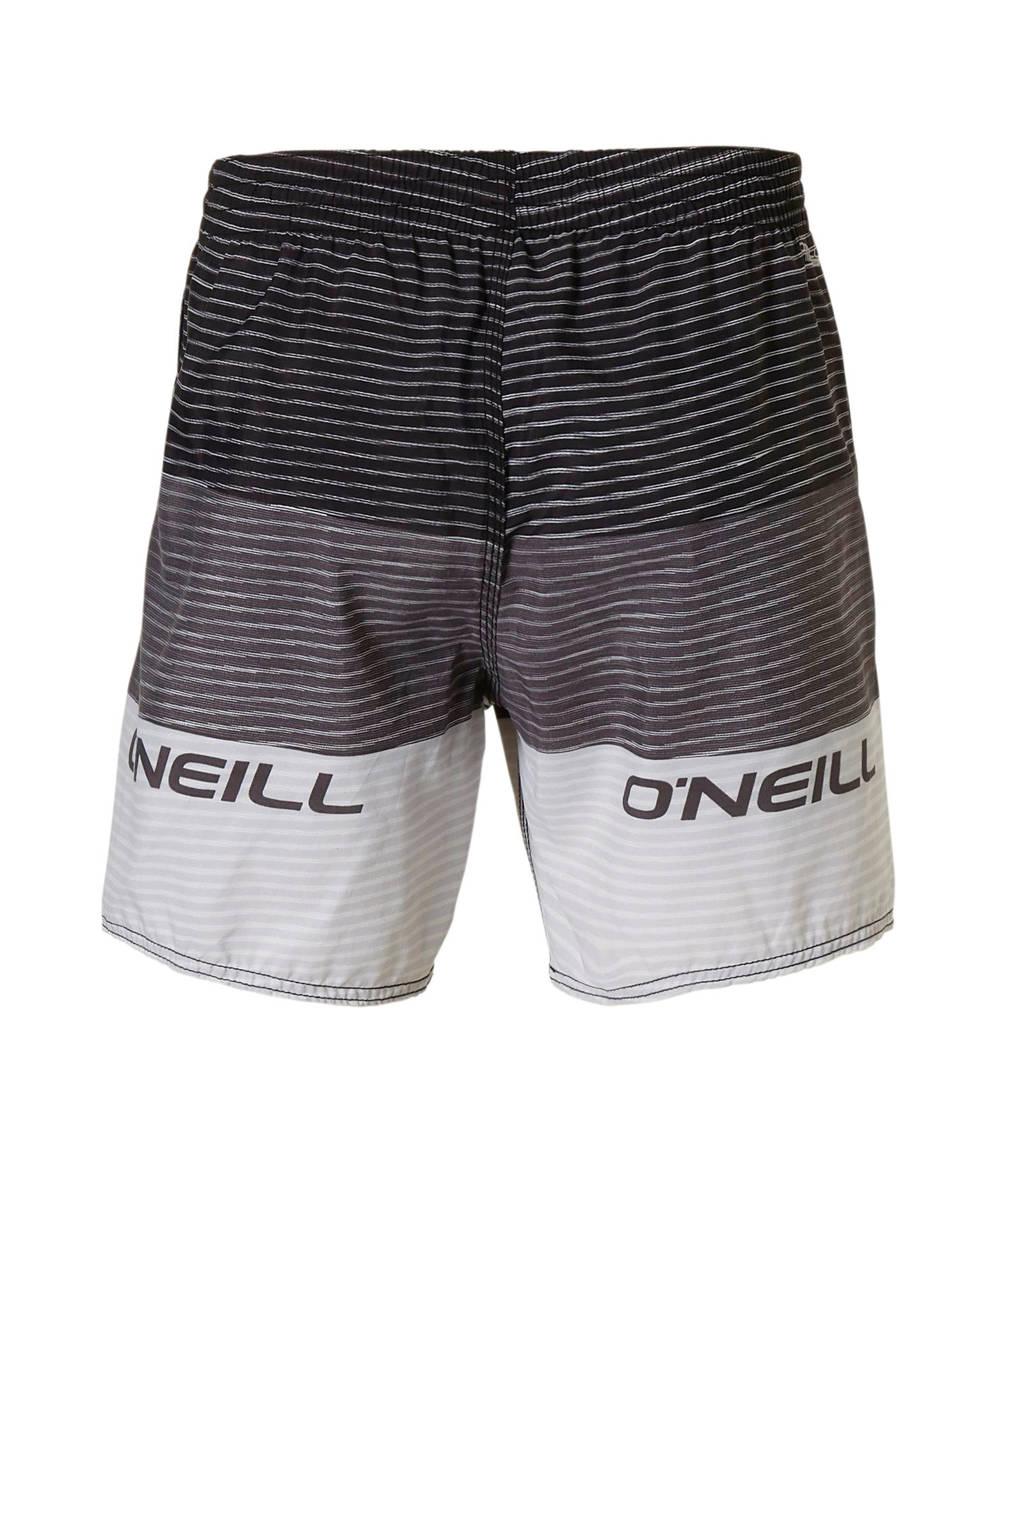 O'Neill zwemshort in een all over print grijs, Zwart/grijs